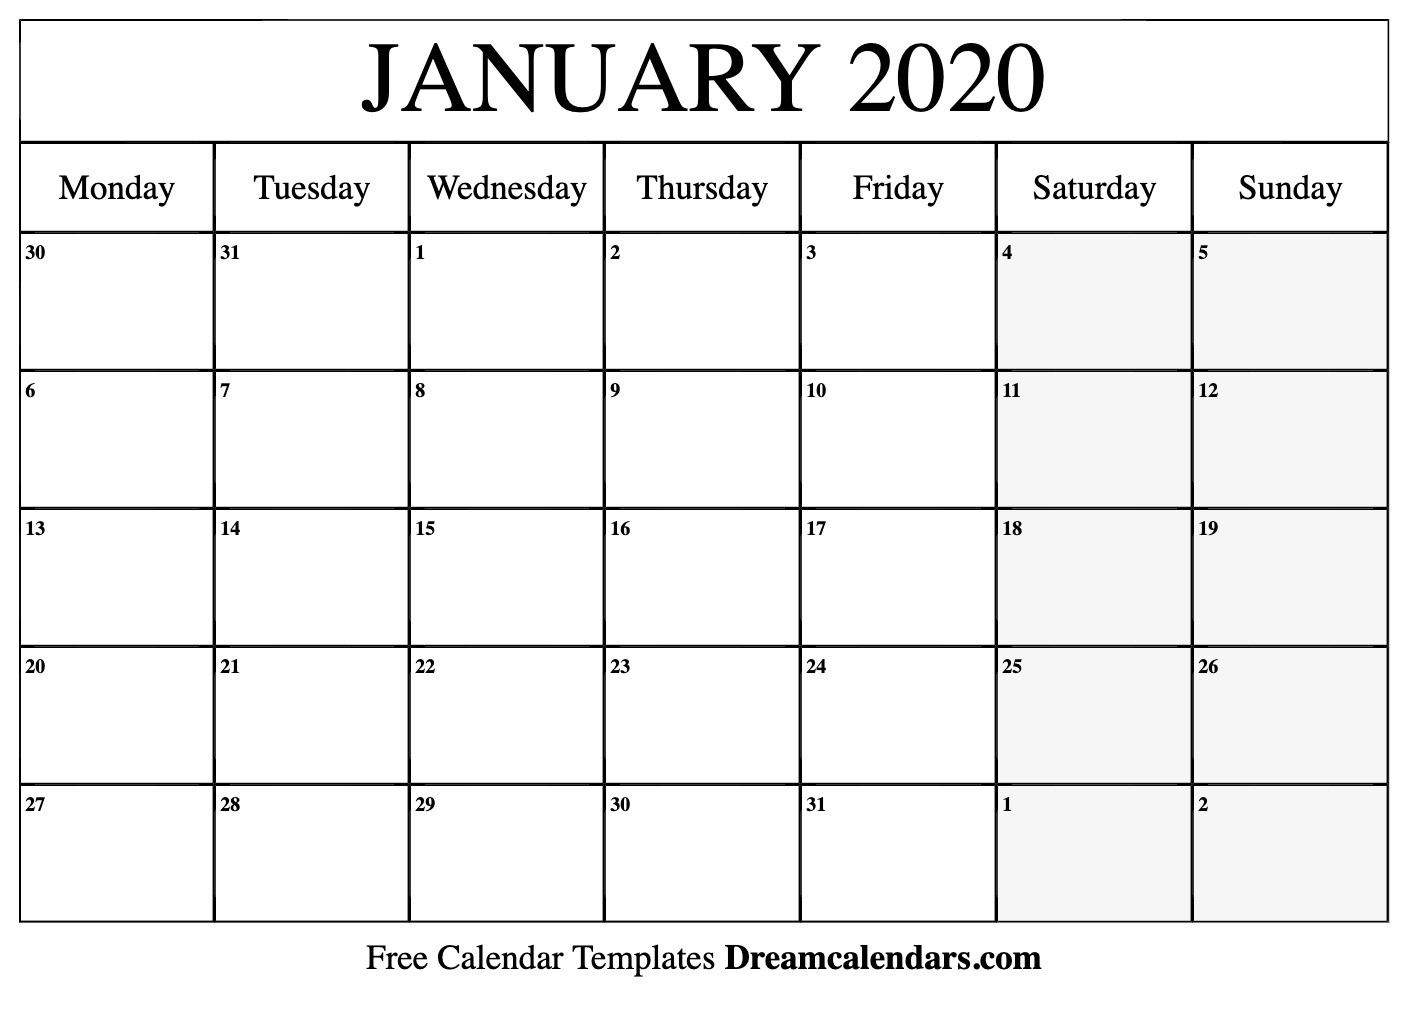 Printable January 2020 Calendar-Image Of January 2020 Calendar